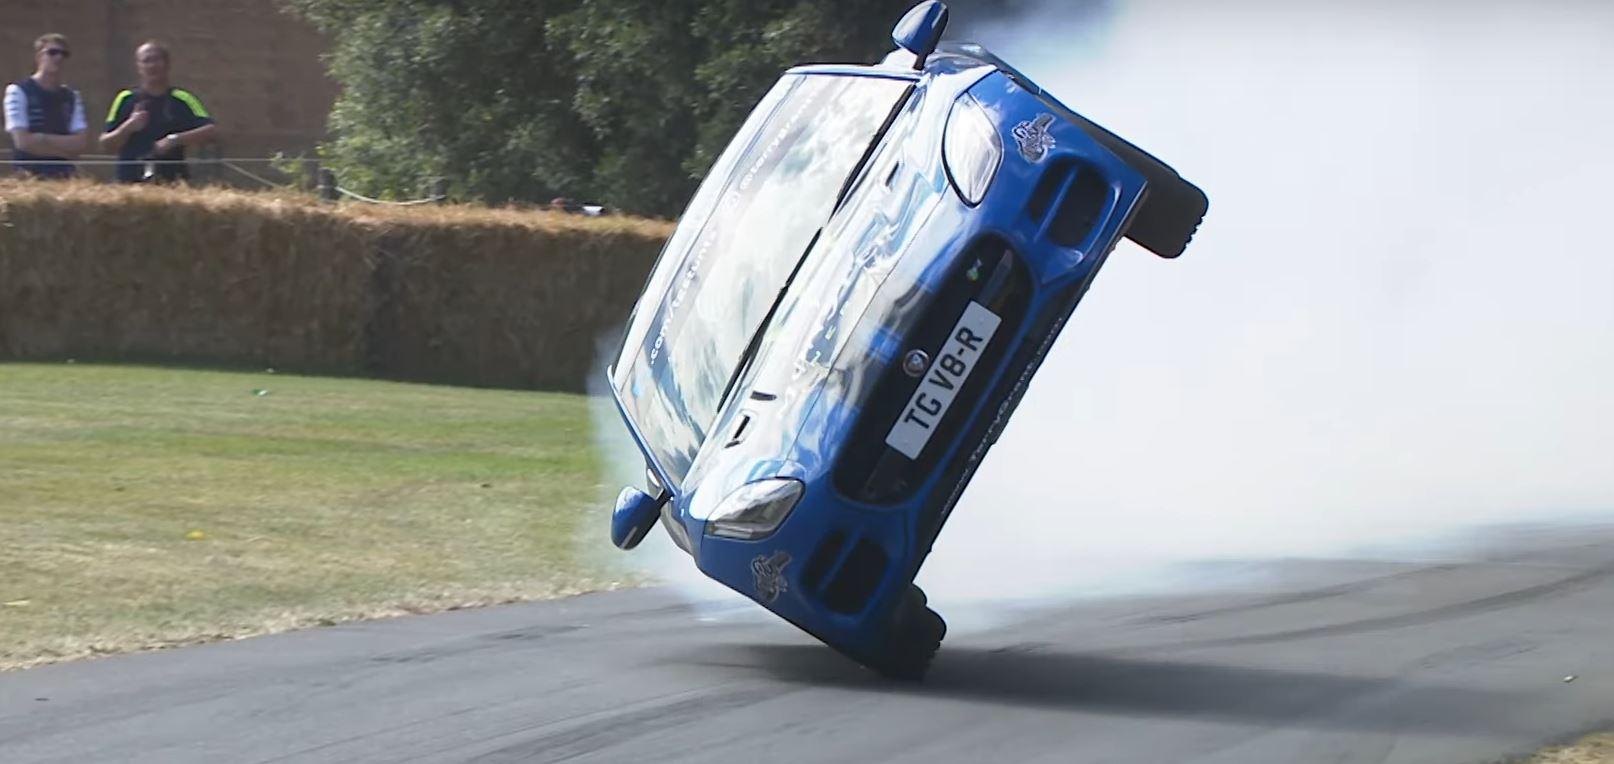 jaguar-f-type-two-wheel-goodwood-lap-looks-like-drivetrain-torture-135821_1